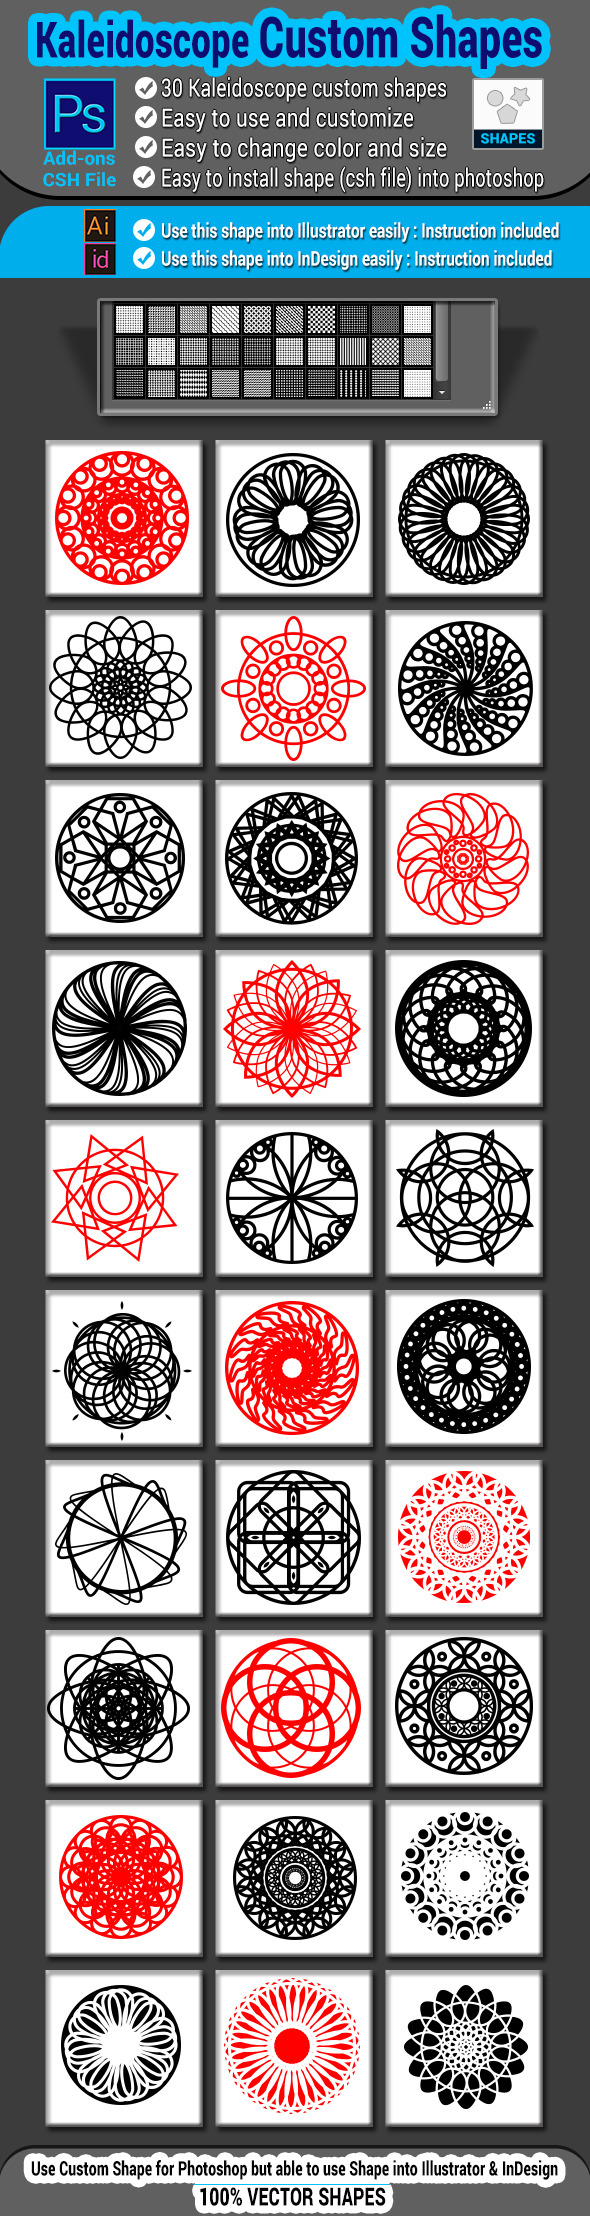 GraphicRiver Kaleidoscope Custom Shapes 9929739